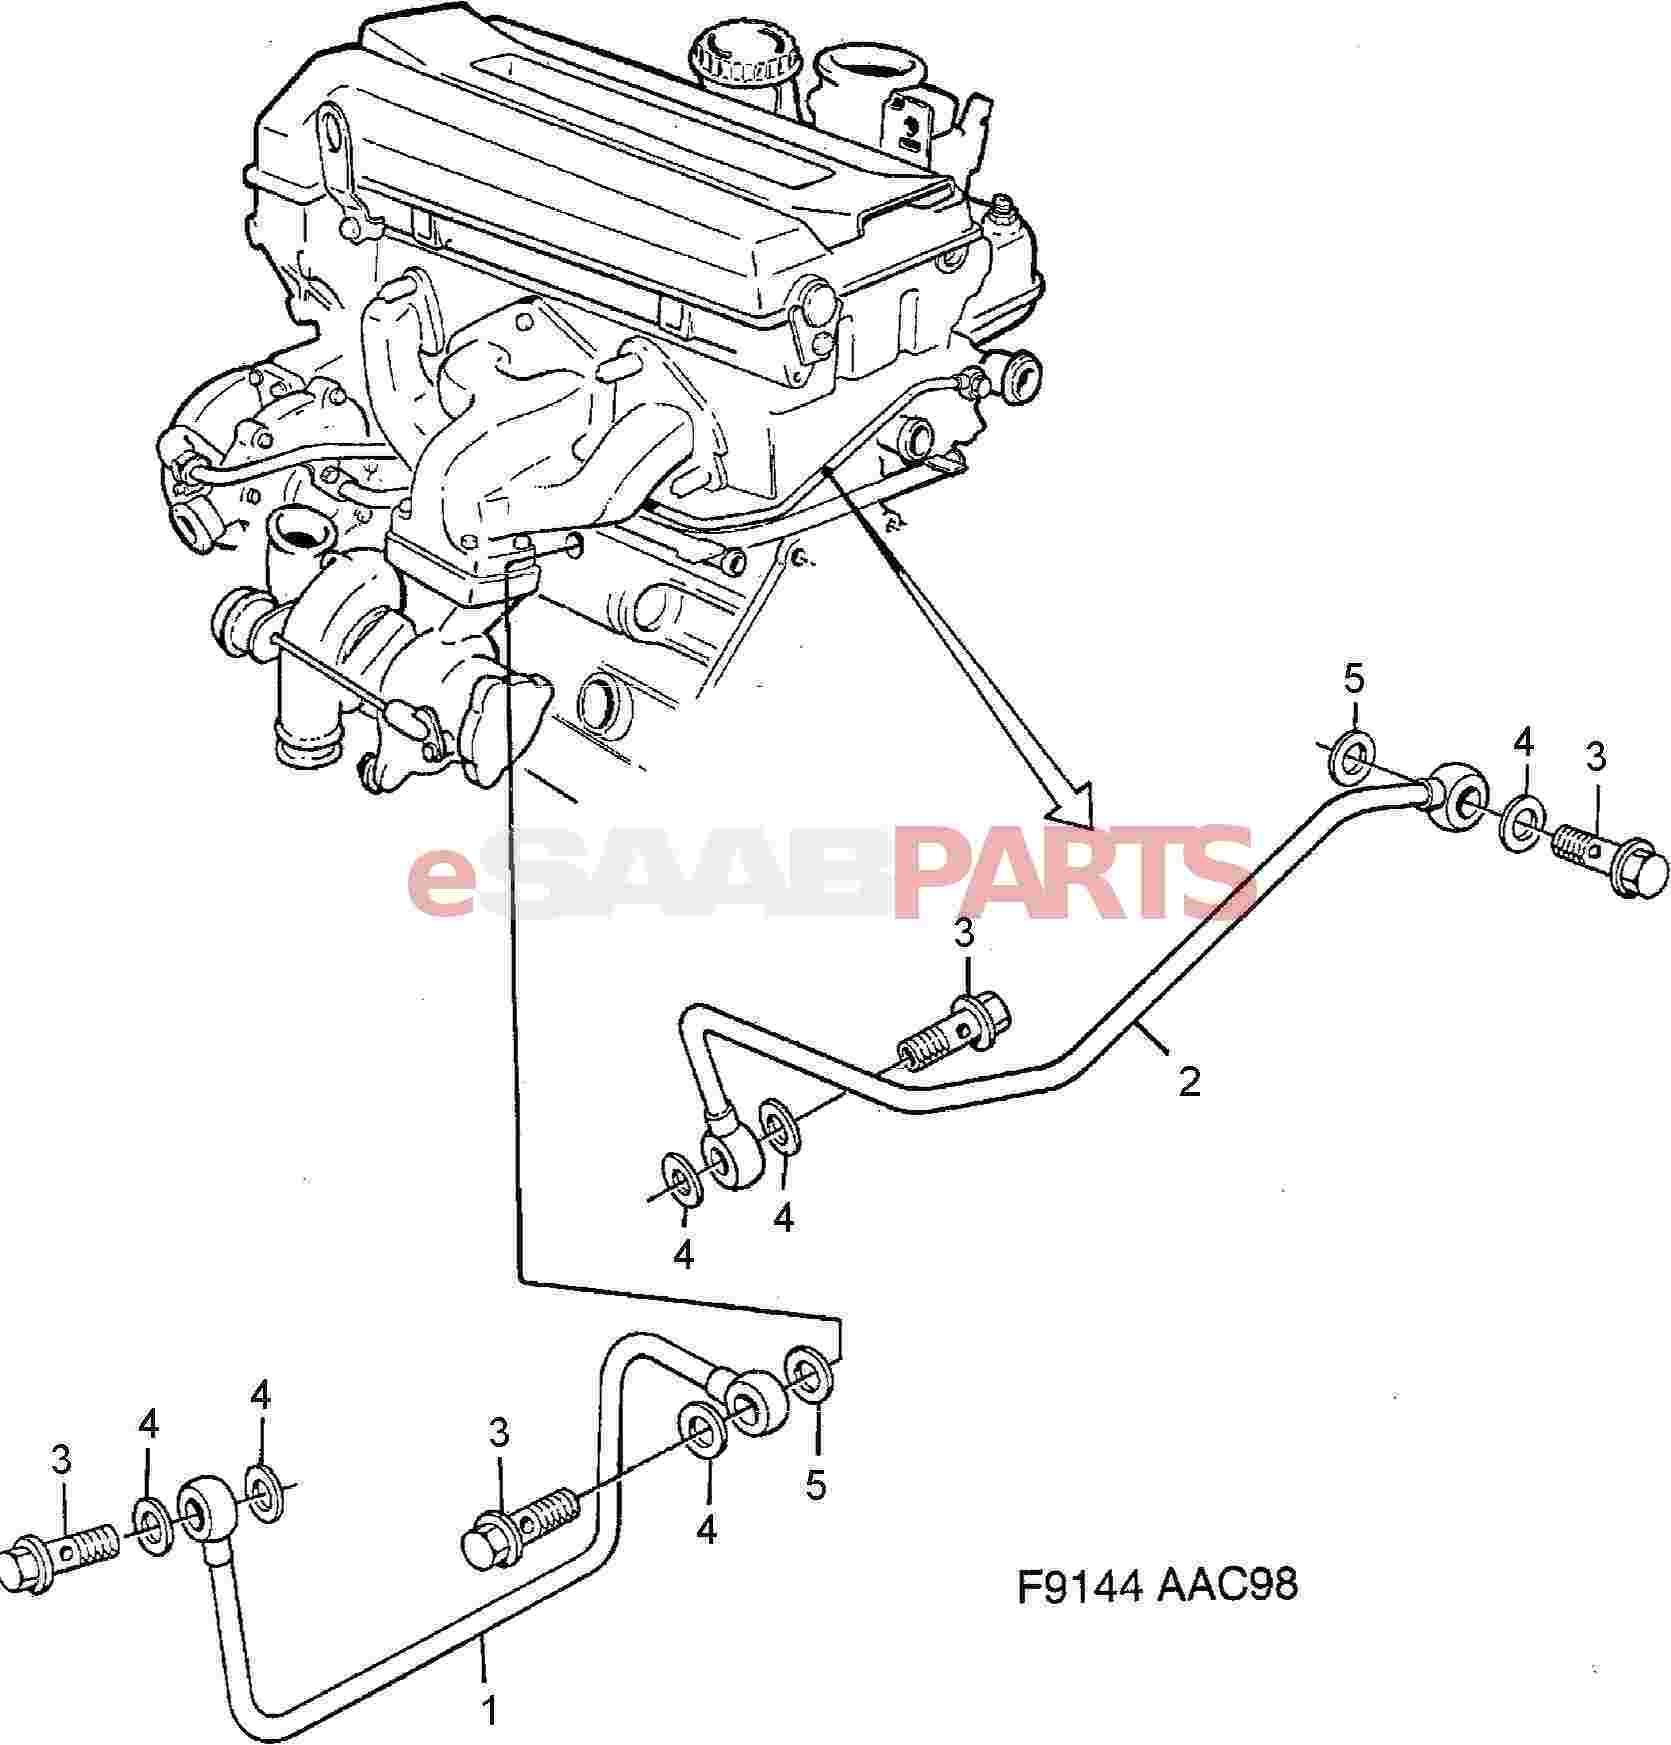 1995 Saab 900 Headlight Wiring Diagram 2005 Subaru Legacy